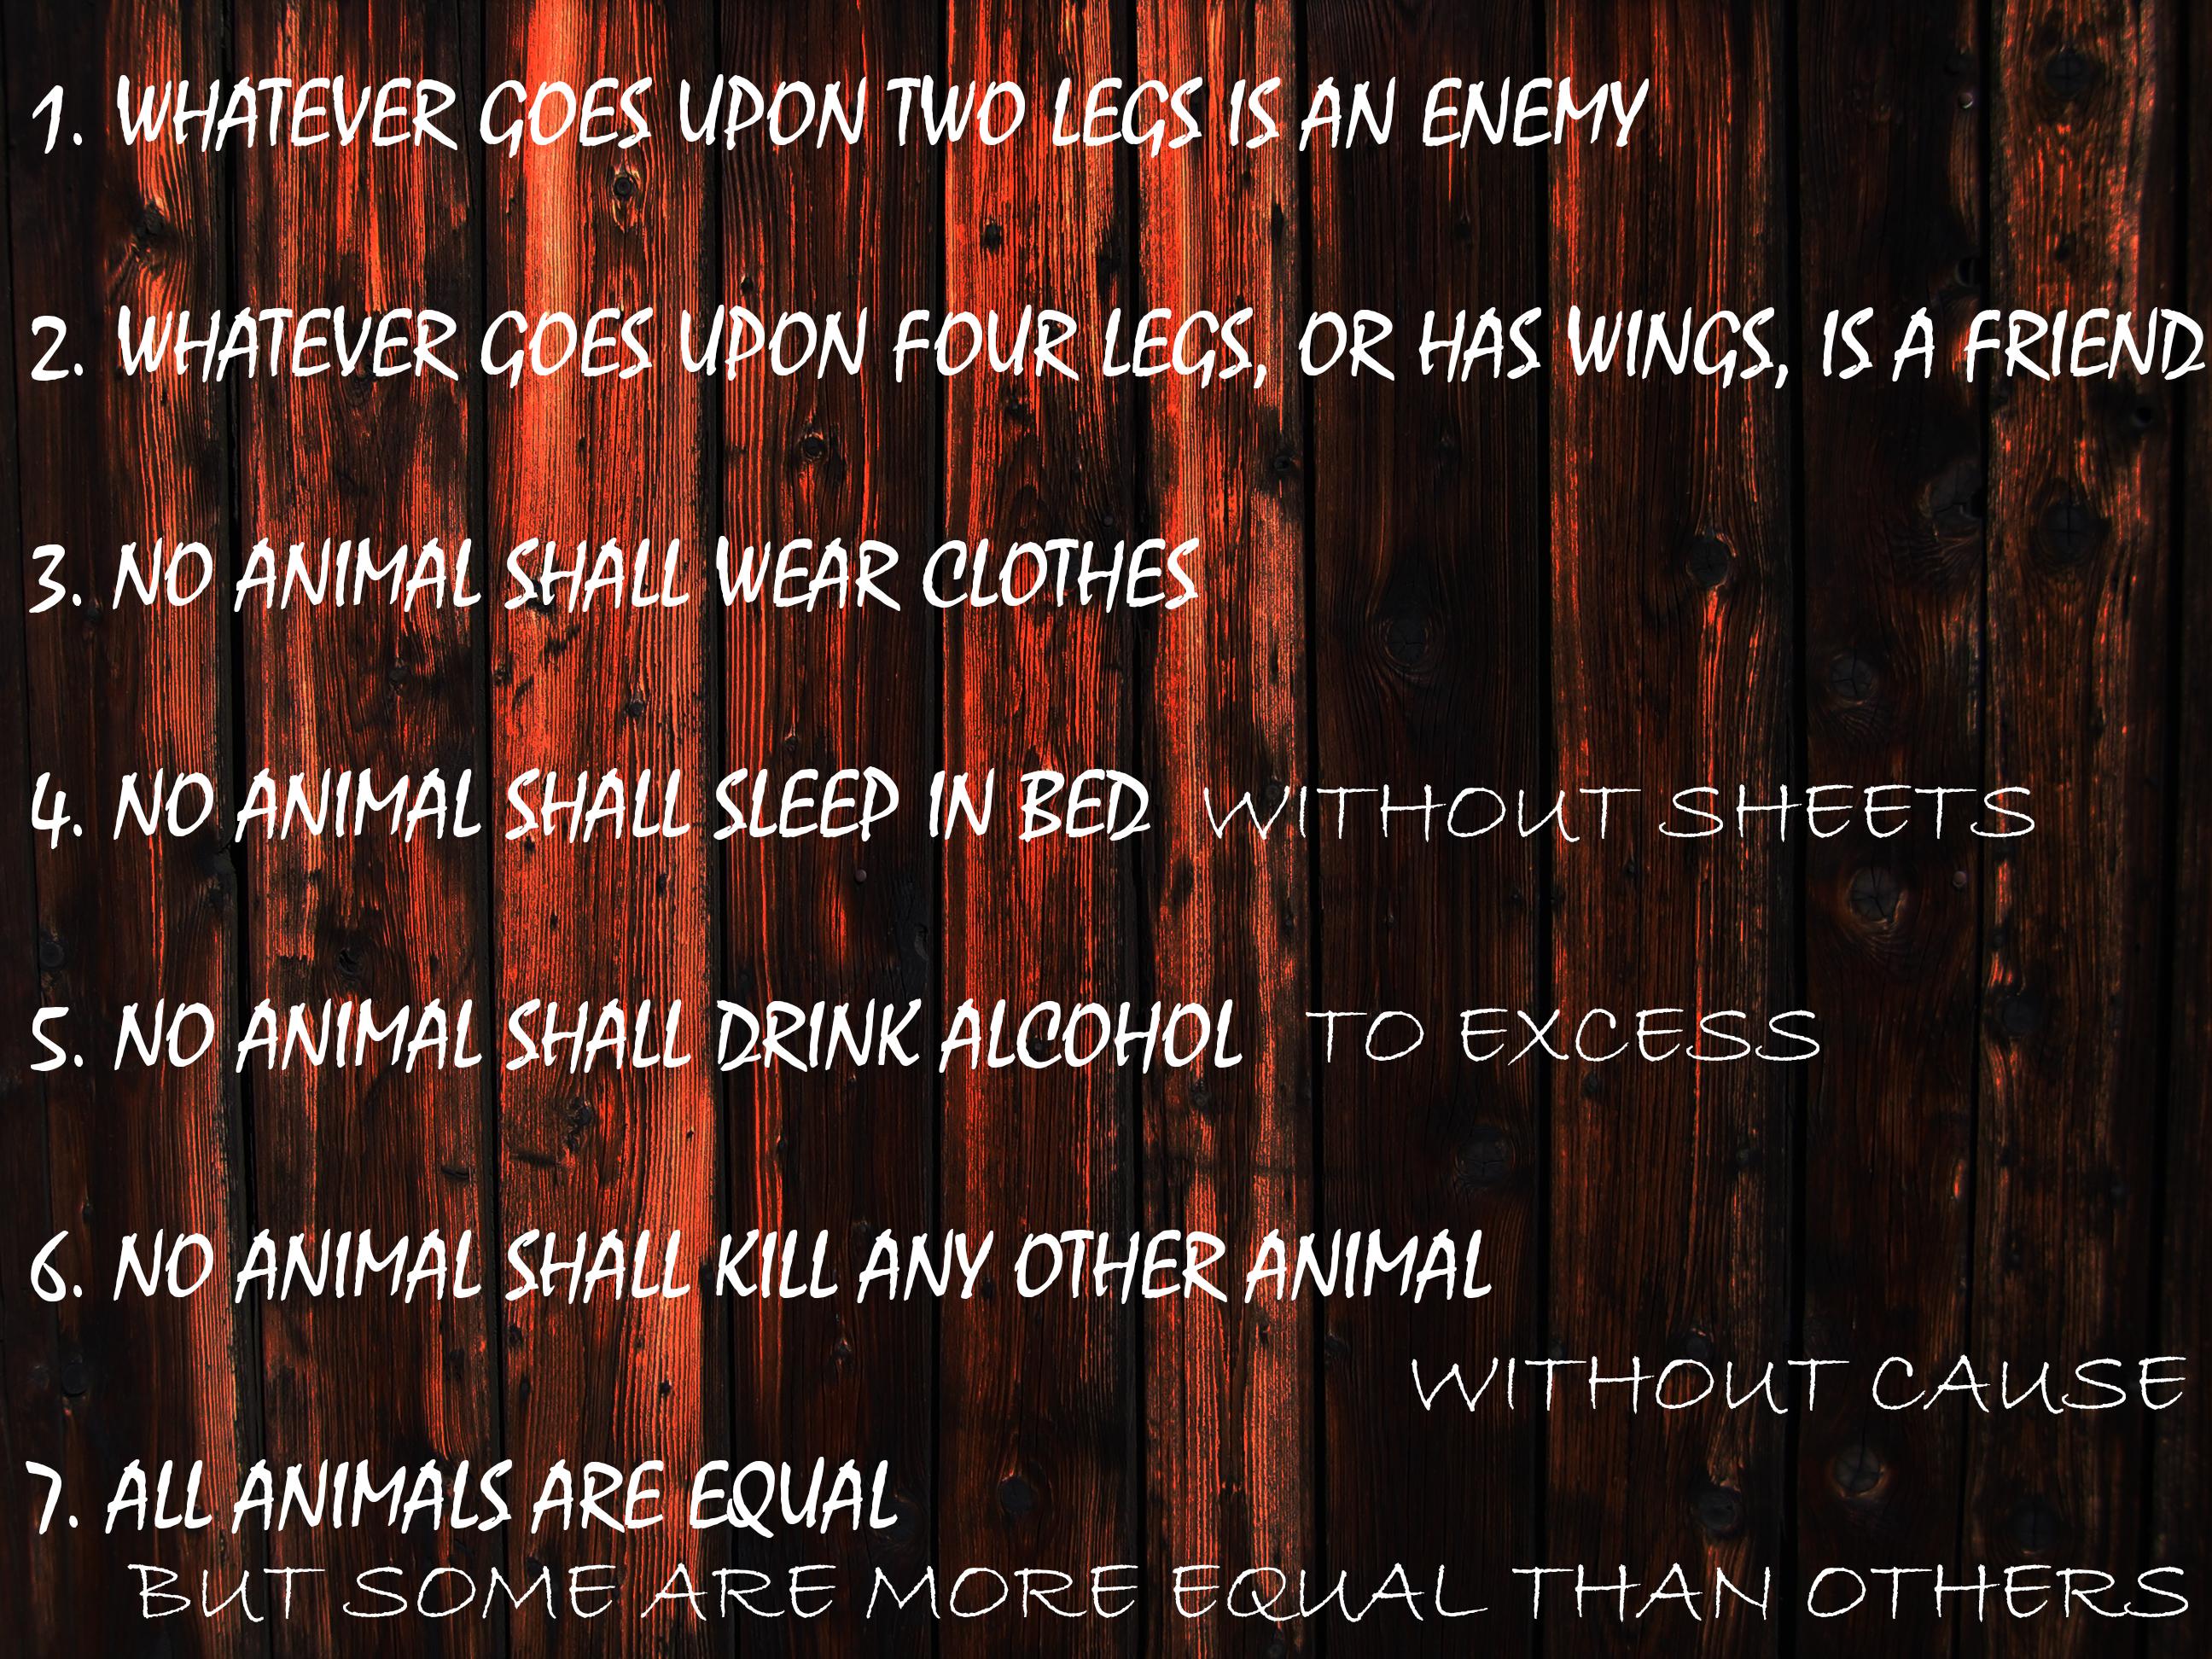 Animal farm commandments